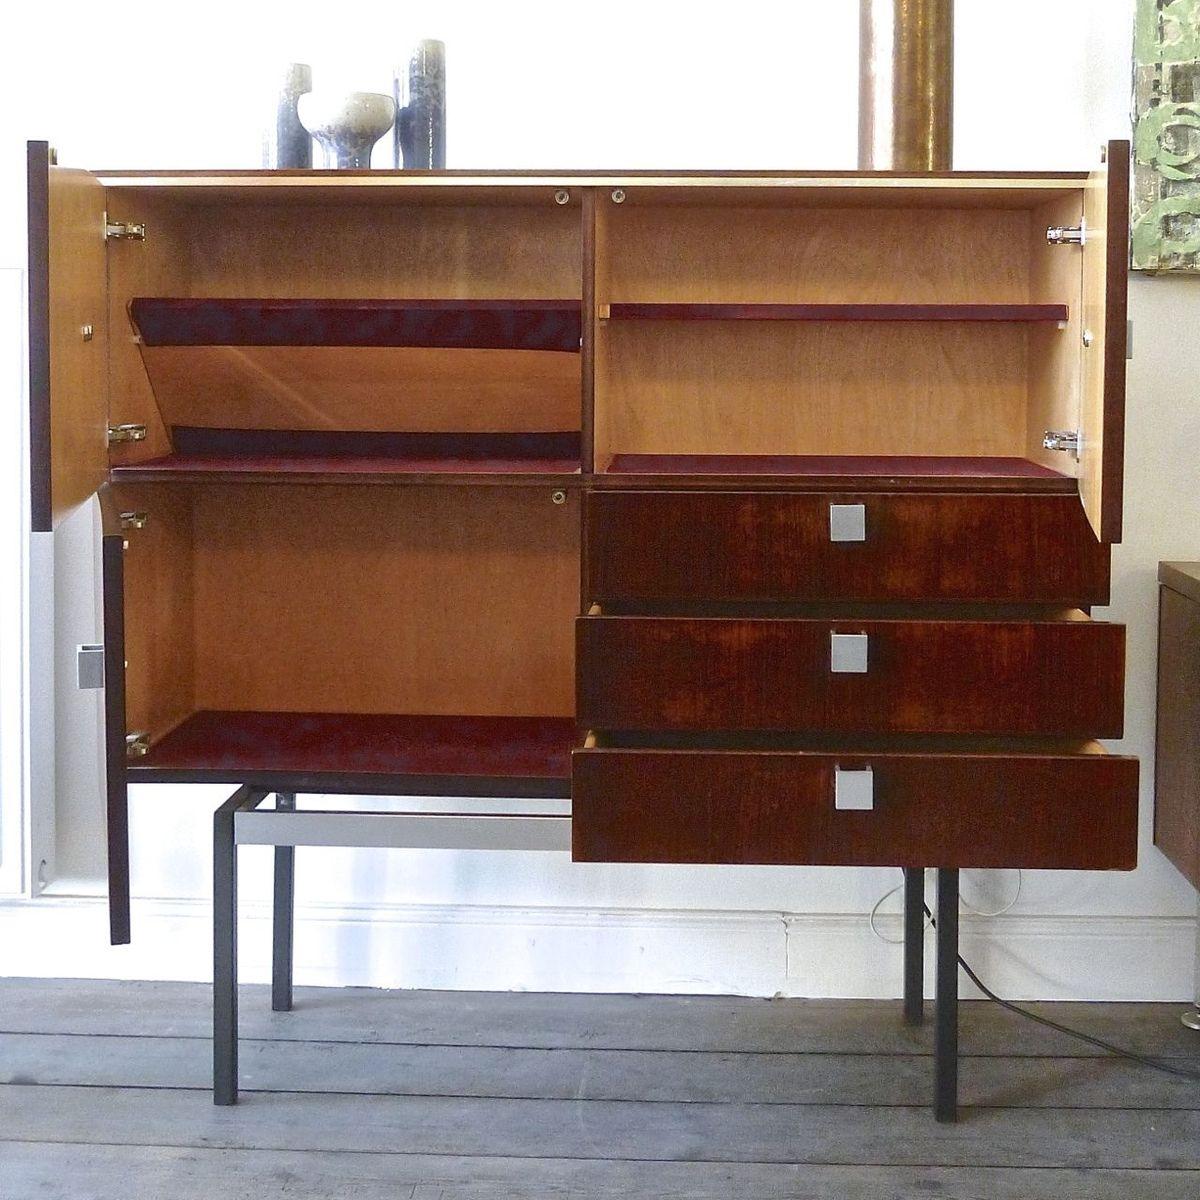 armoire en palissandre par alfred hendrickx belgique. Black Bedroom Furniture Sets. Home Design Ideas